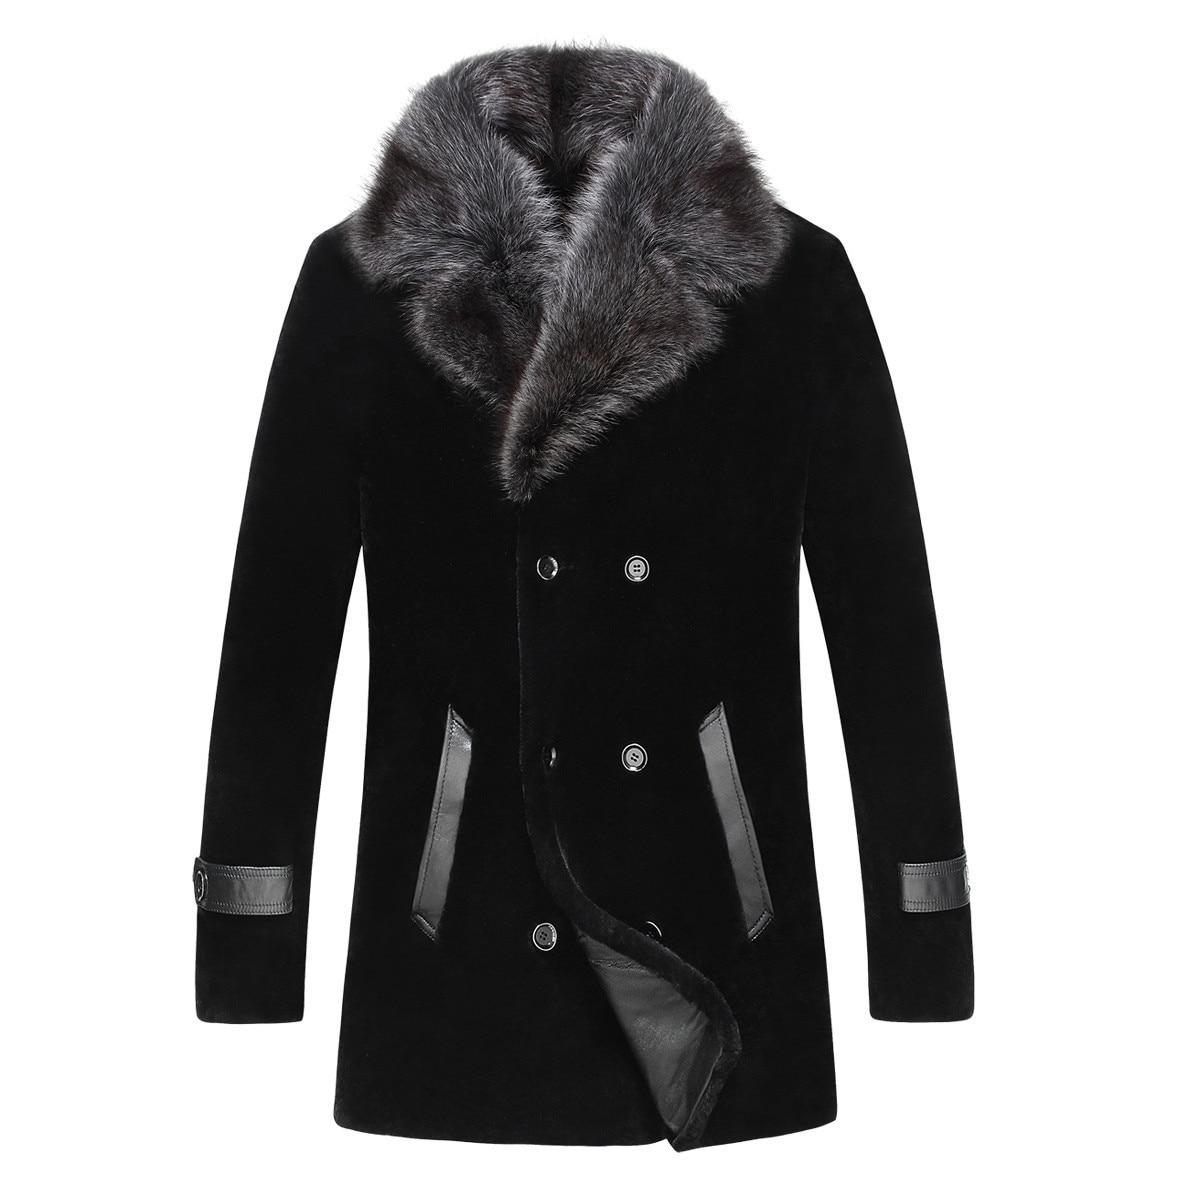 Real Sheep Shearling Fur Coat Men's Winter Jacket Real Raccoon Fur Collar 100% Wool Fur Coats Plus Size 5xl  LSY080870 MY1838